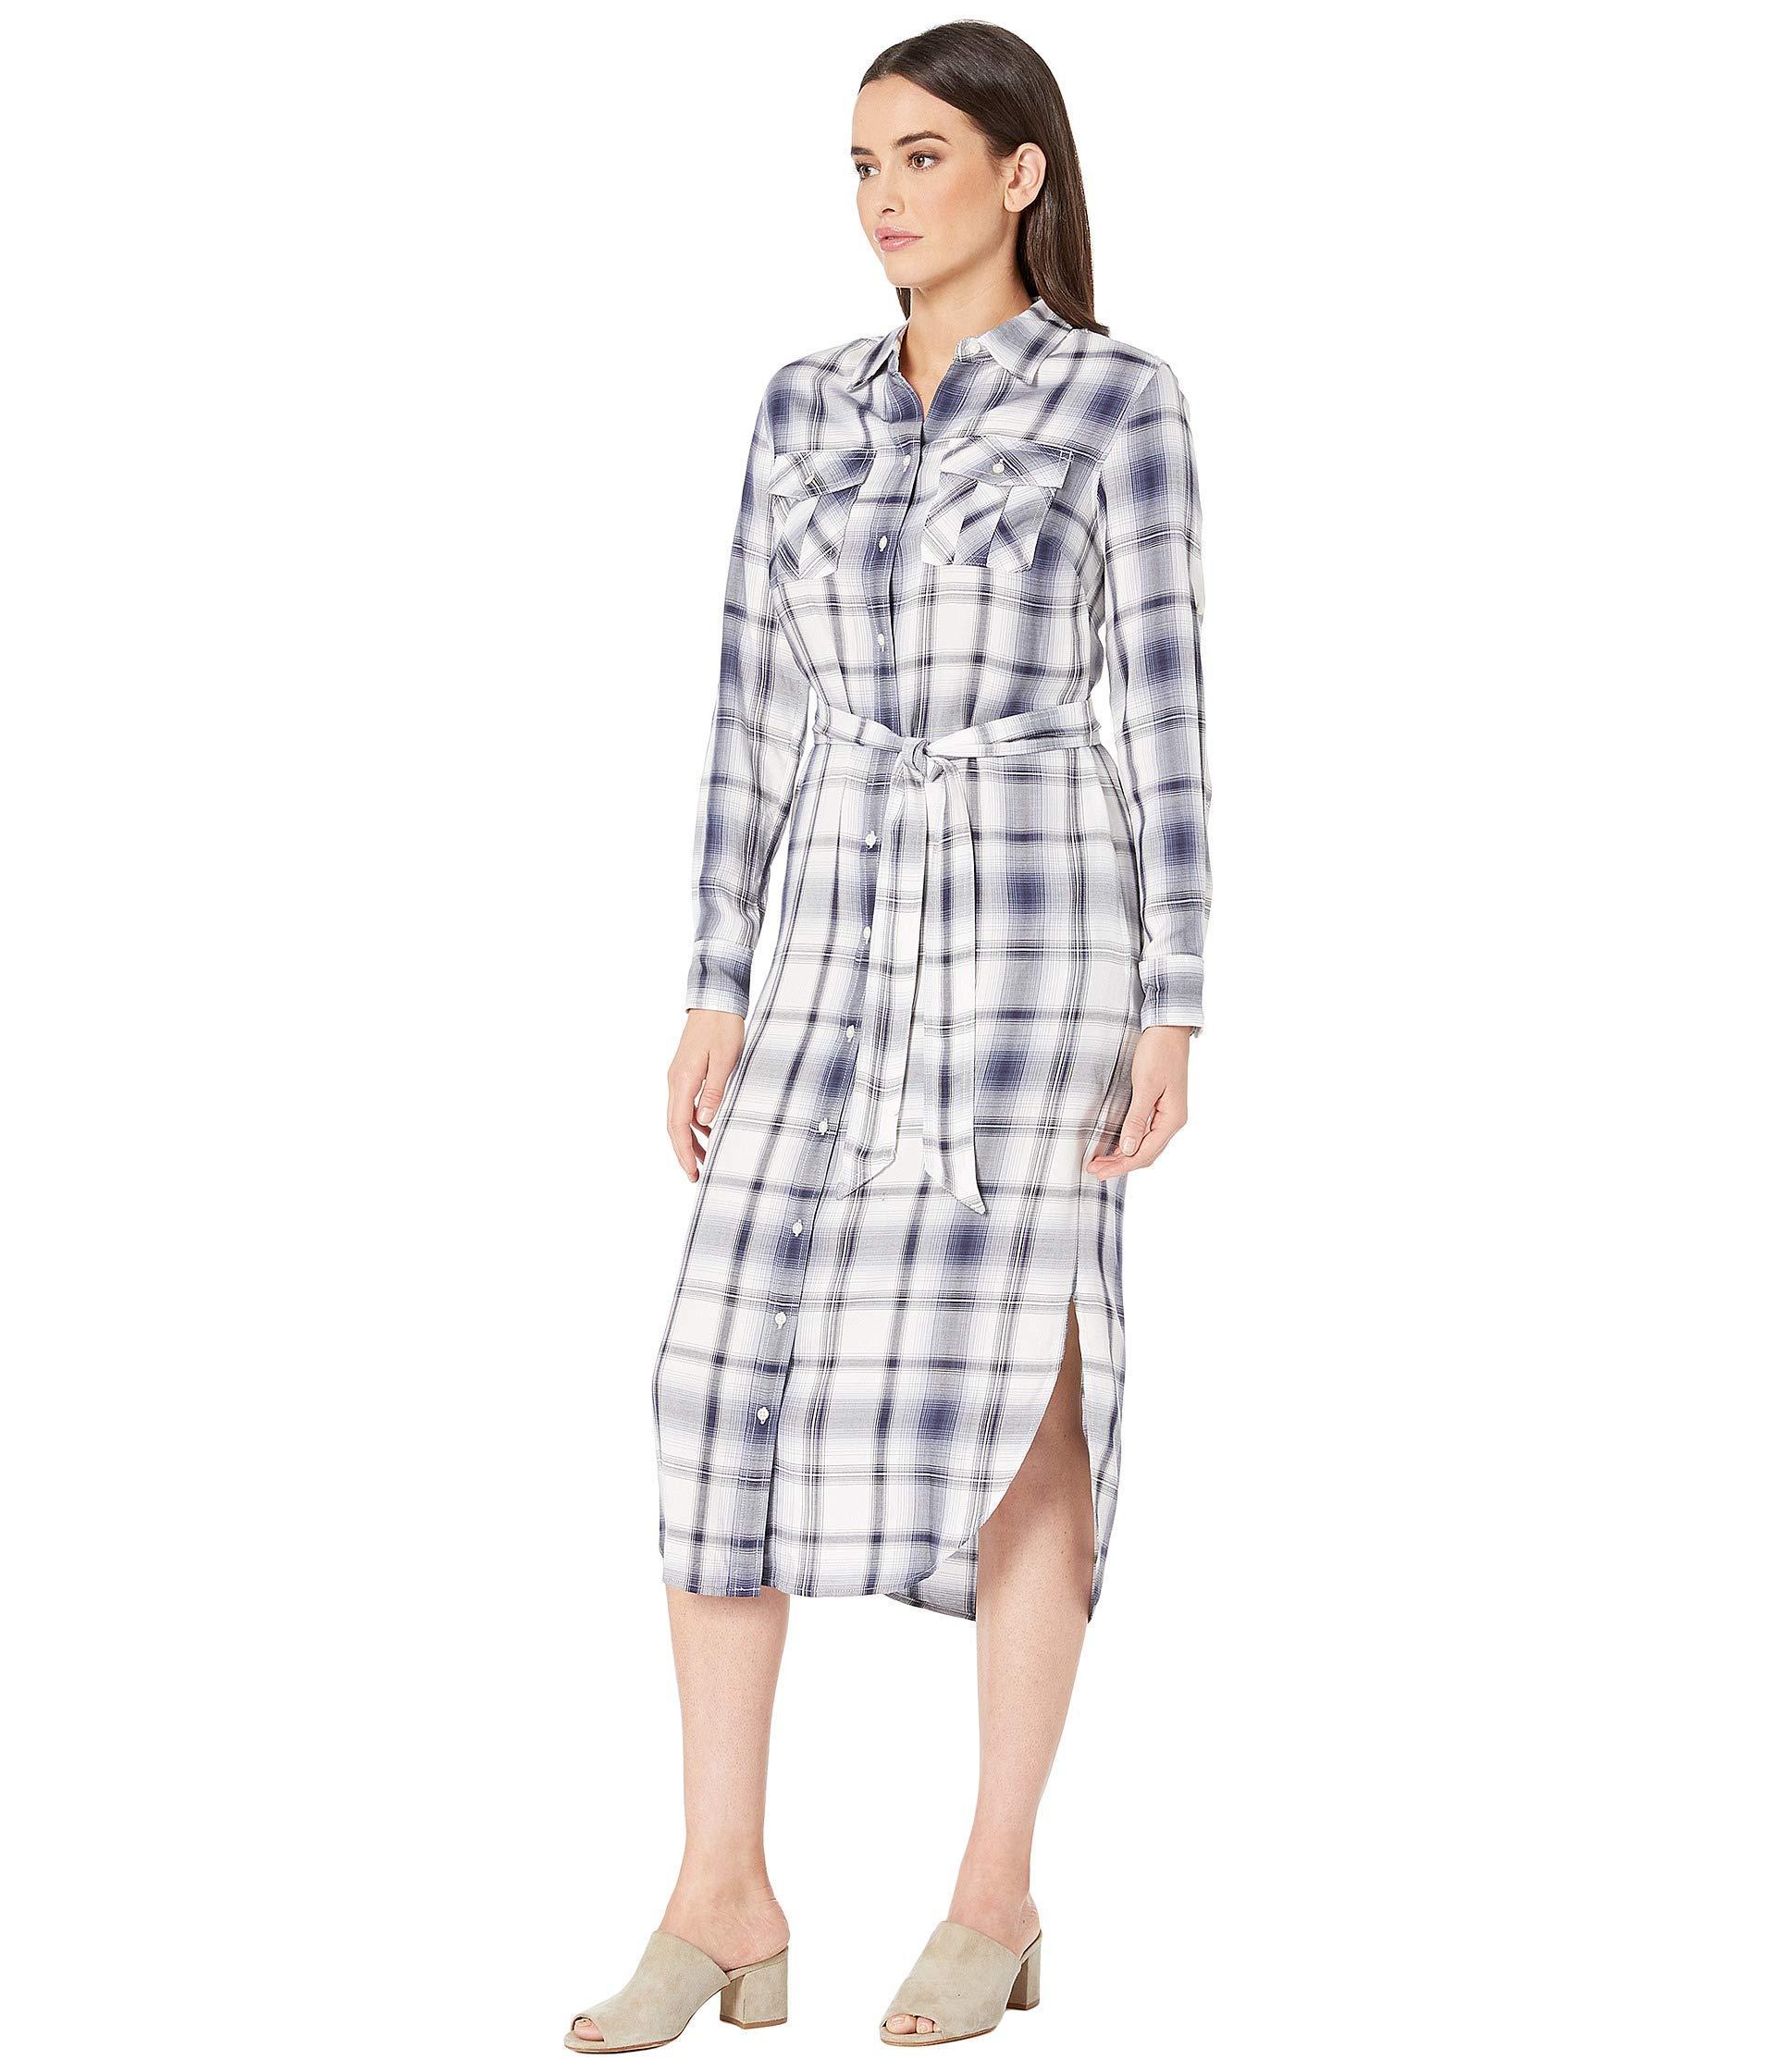 79008464b5eb0 Lyst - Lauren by Ralph Lauren Plaid Herringbone Shirtdress (navy Multi)  Women s Dress in Blue